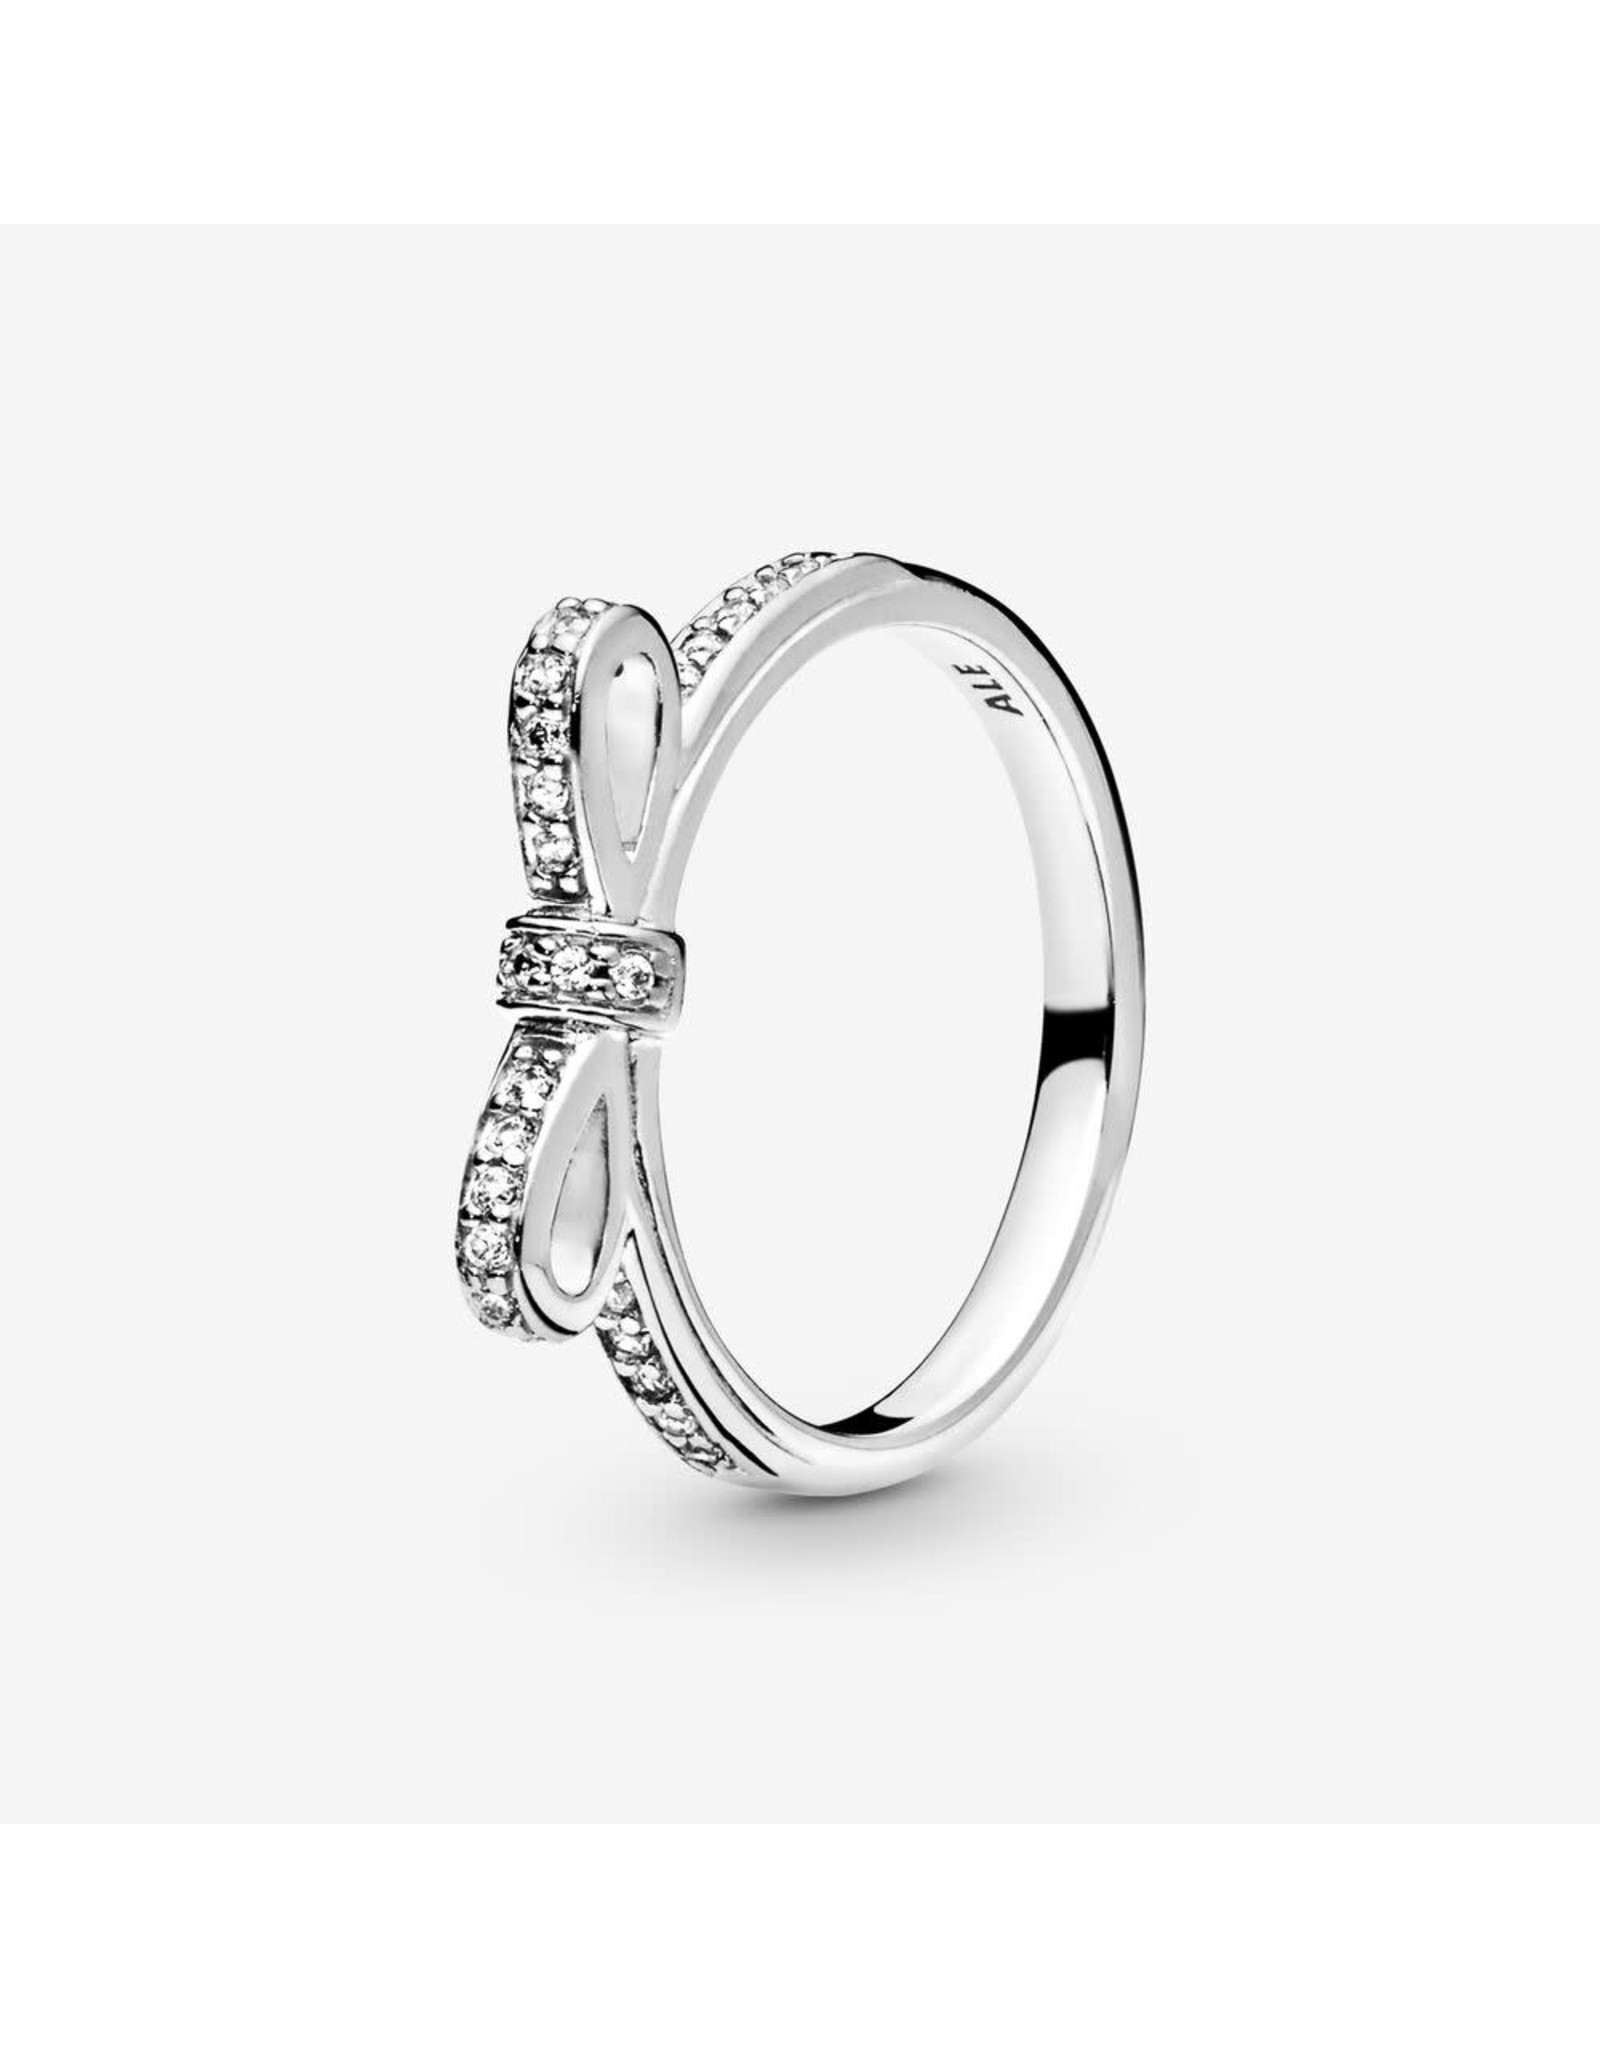 Pandora Pandora Ring,190906CZ, Sparkling Bow, Clear CZ